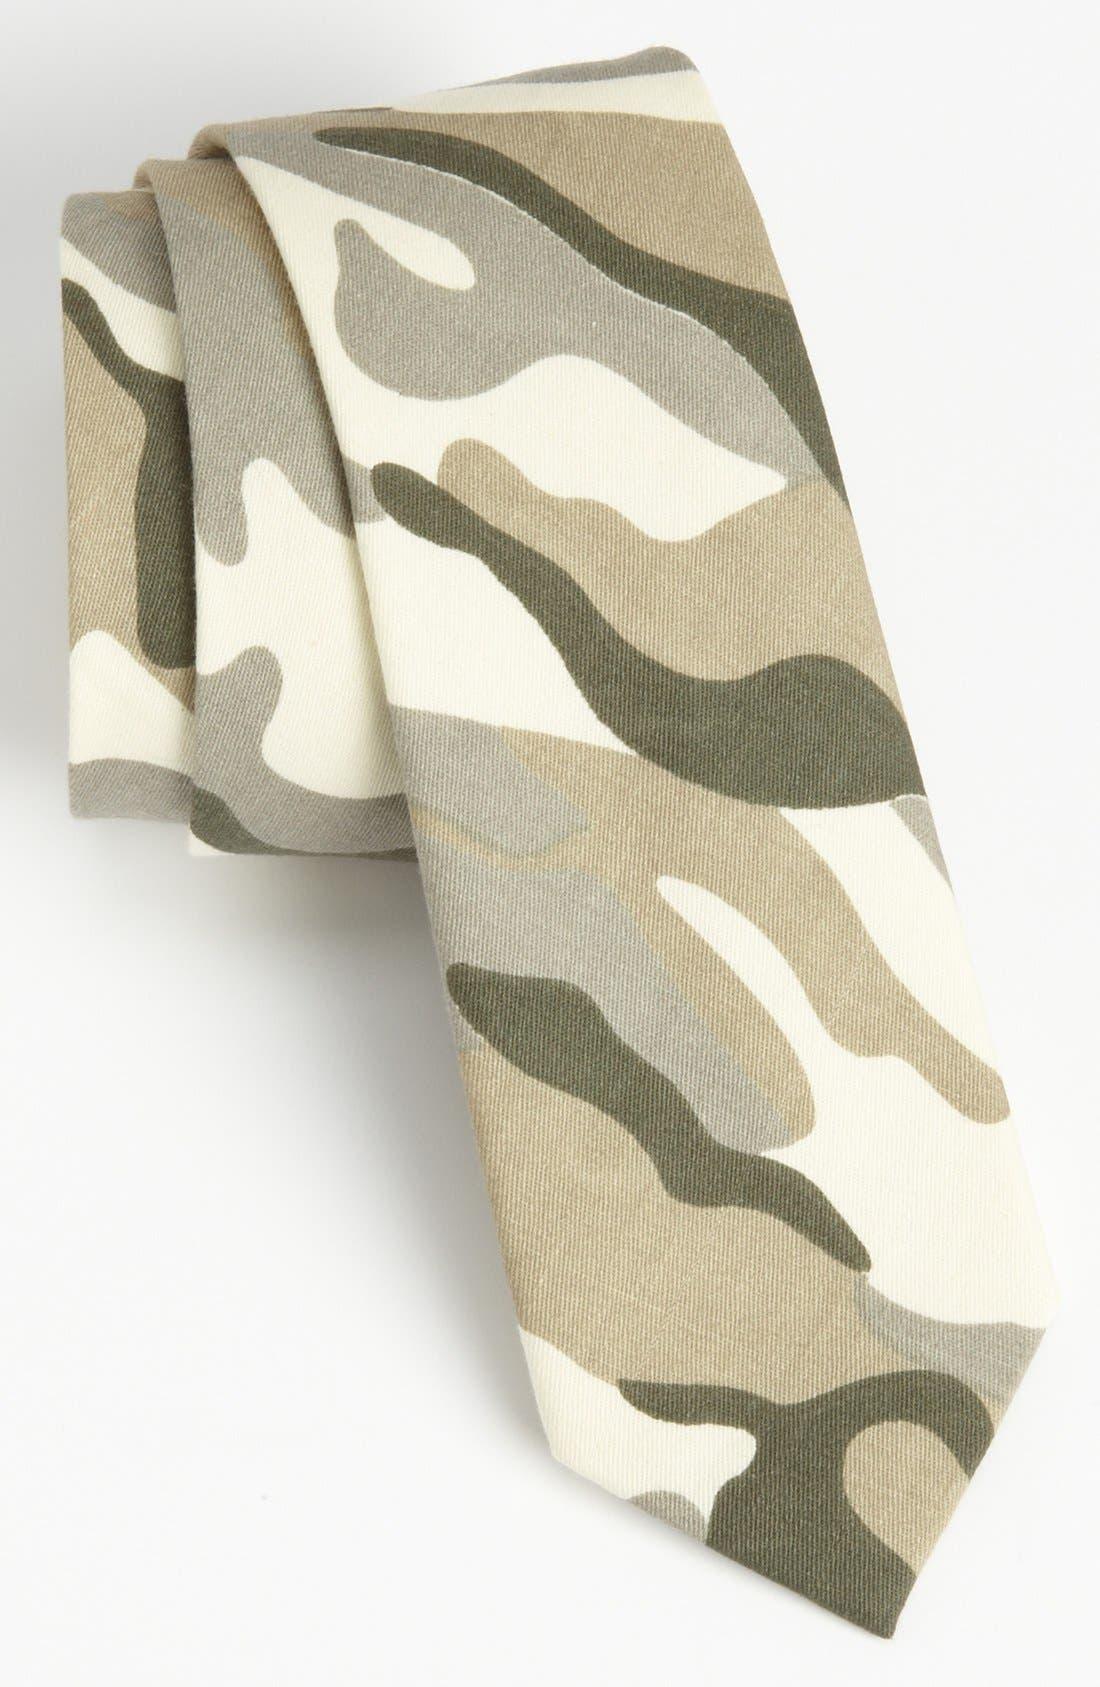 Alternate Image 1 Selected - Simon Printed Cotton Tie